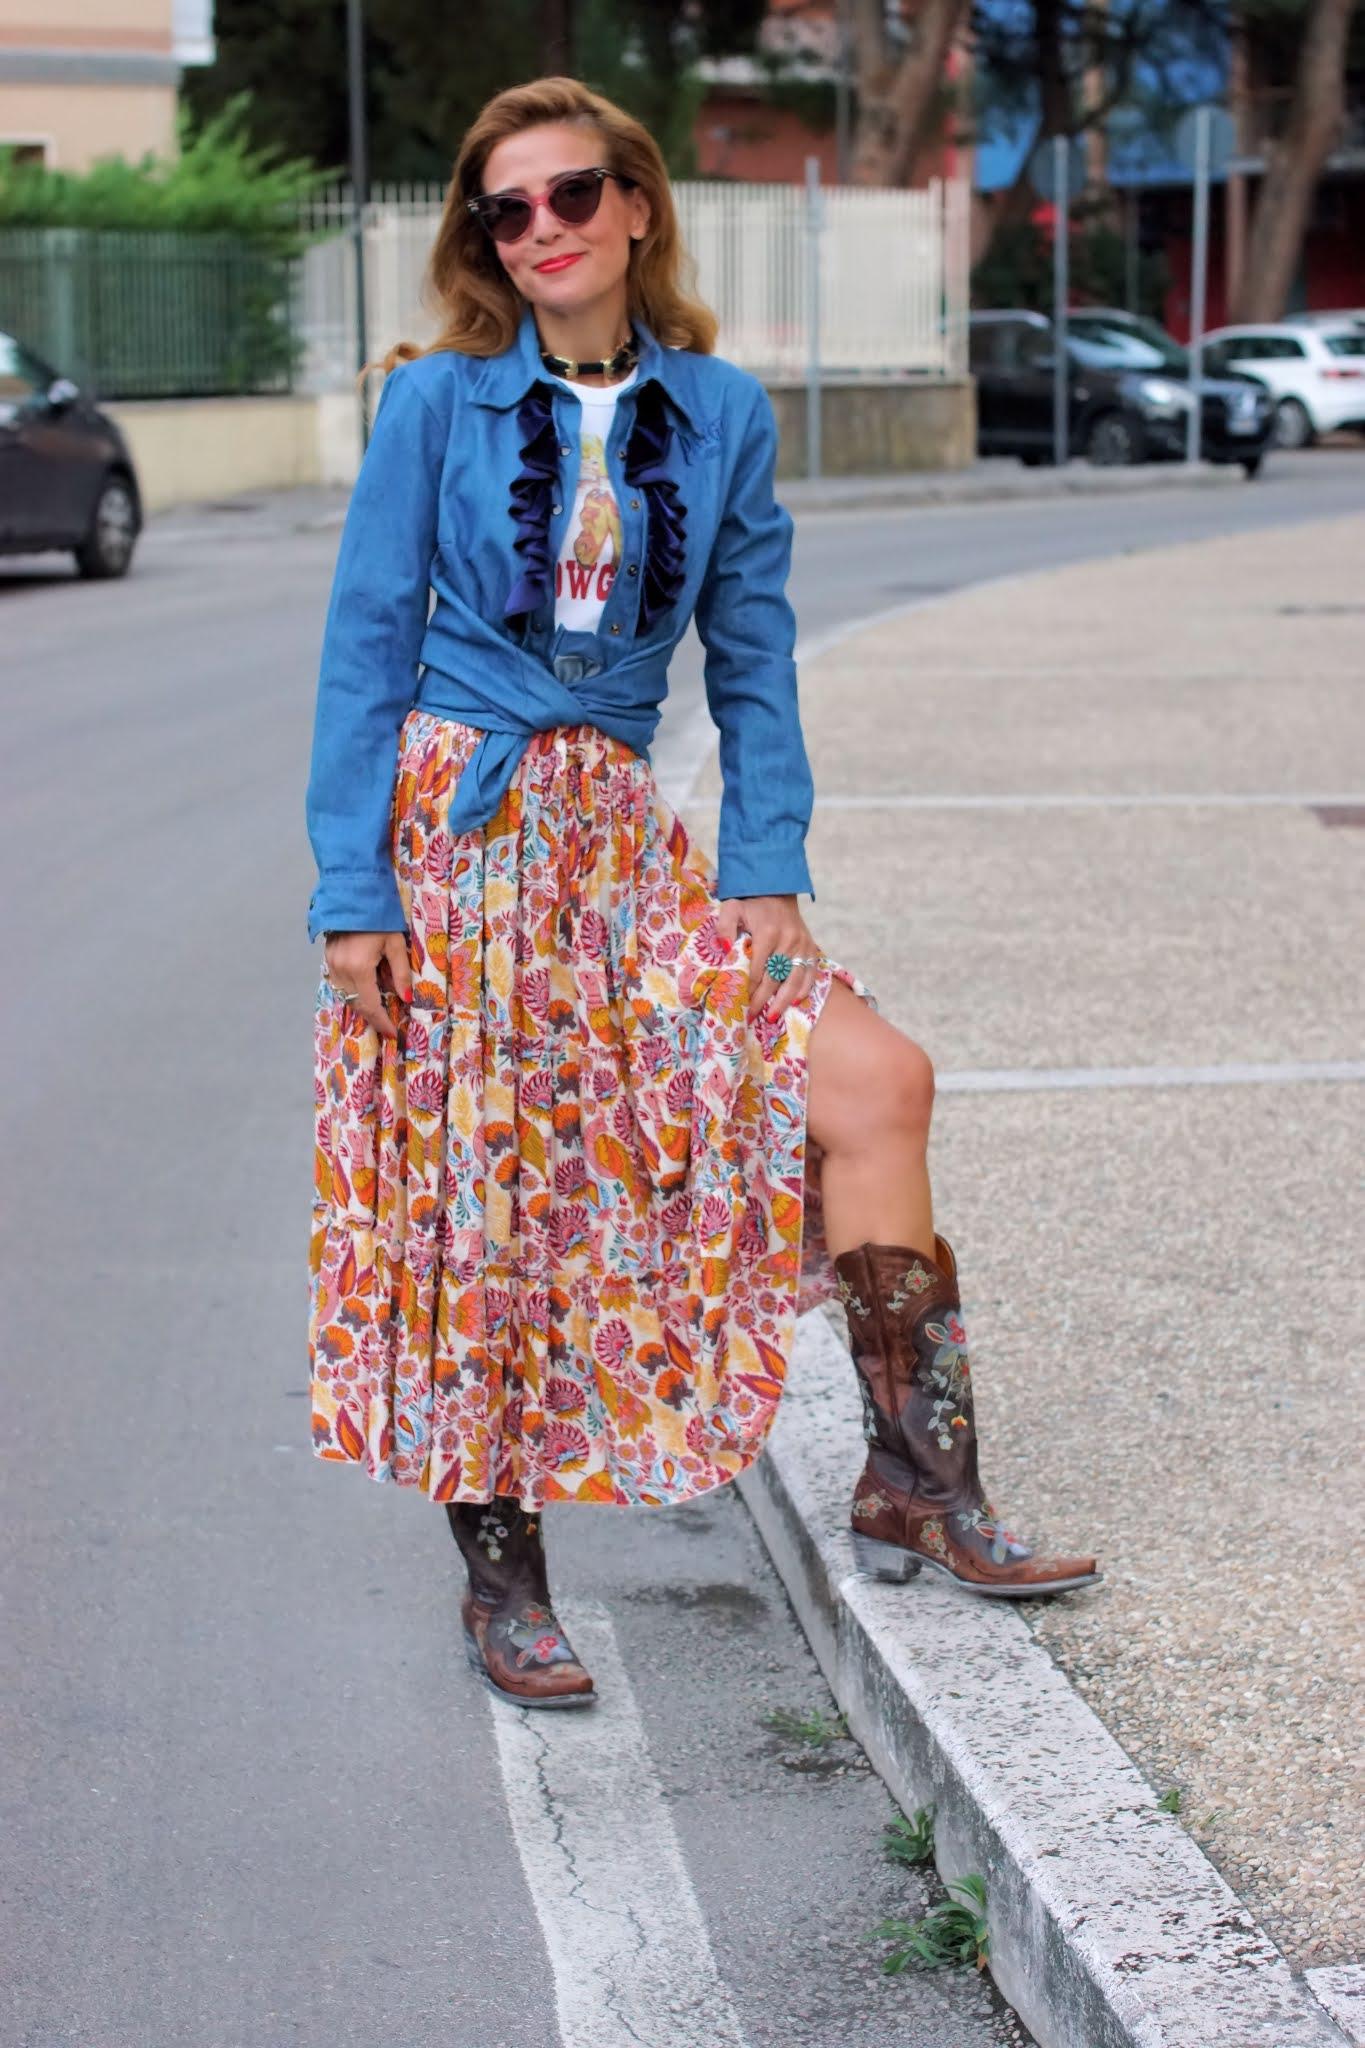 Urban country style: ruffle shirt